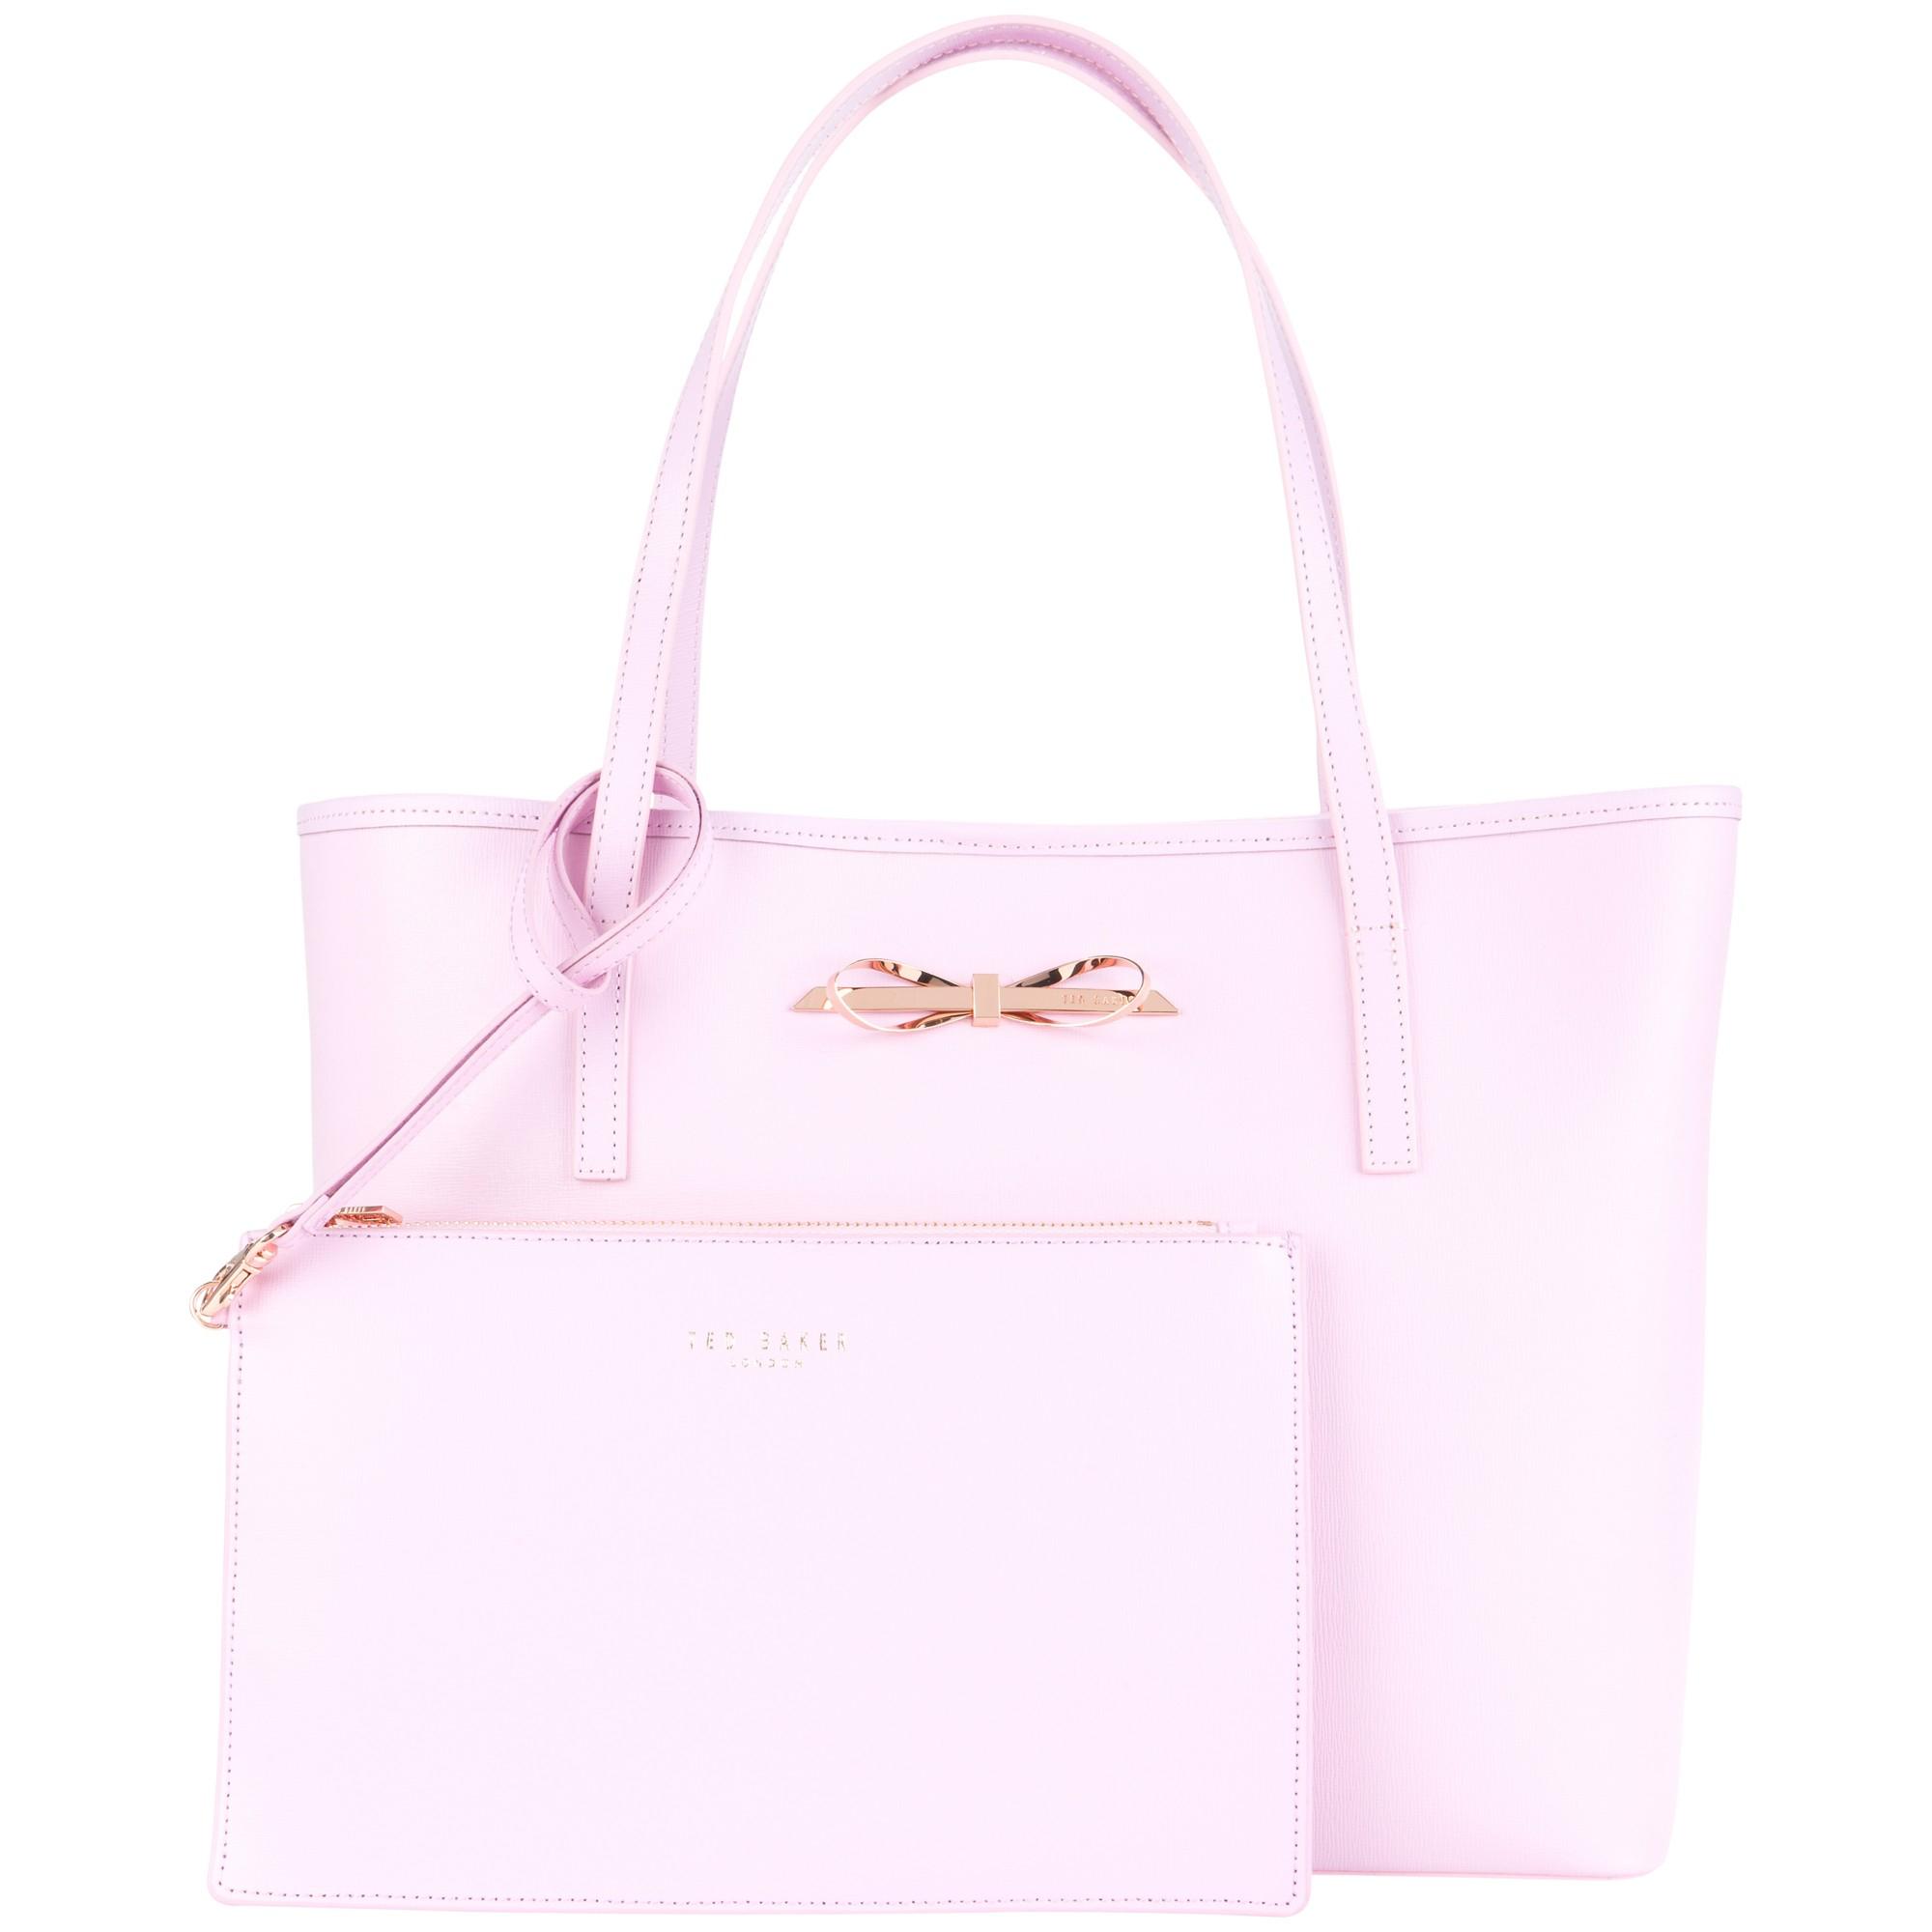 e091ea5c108504 Ted Baker Pink Handbag - Foto Handbag All Collections Salonagafiya.Com